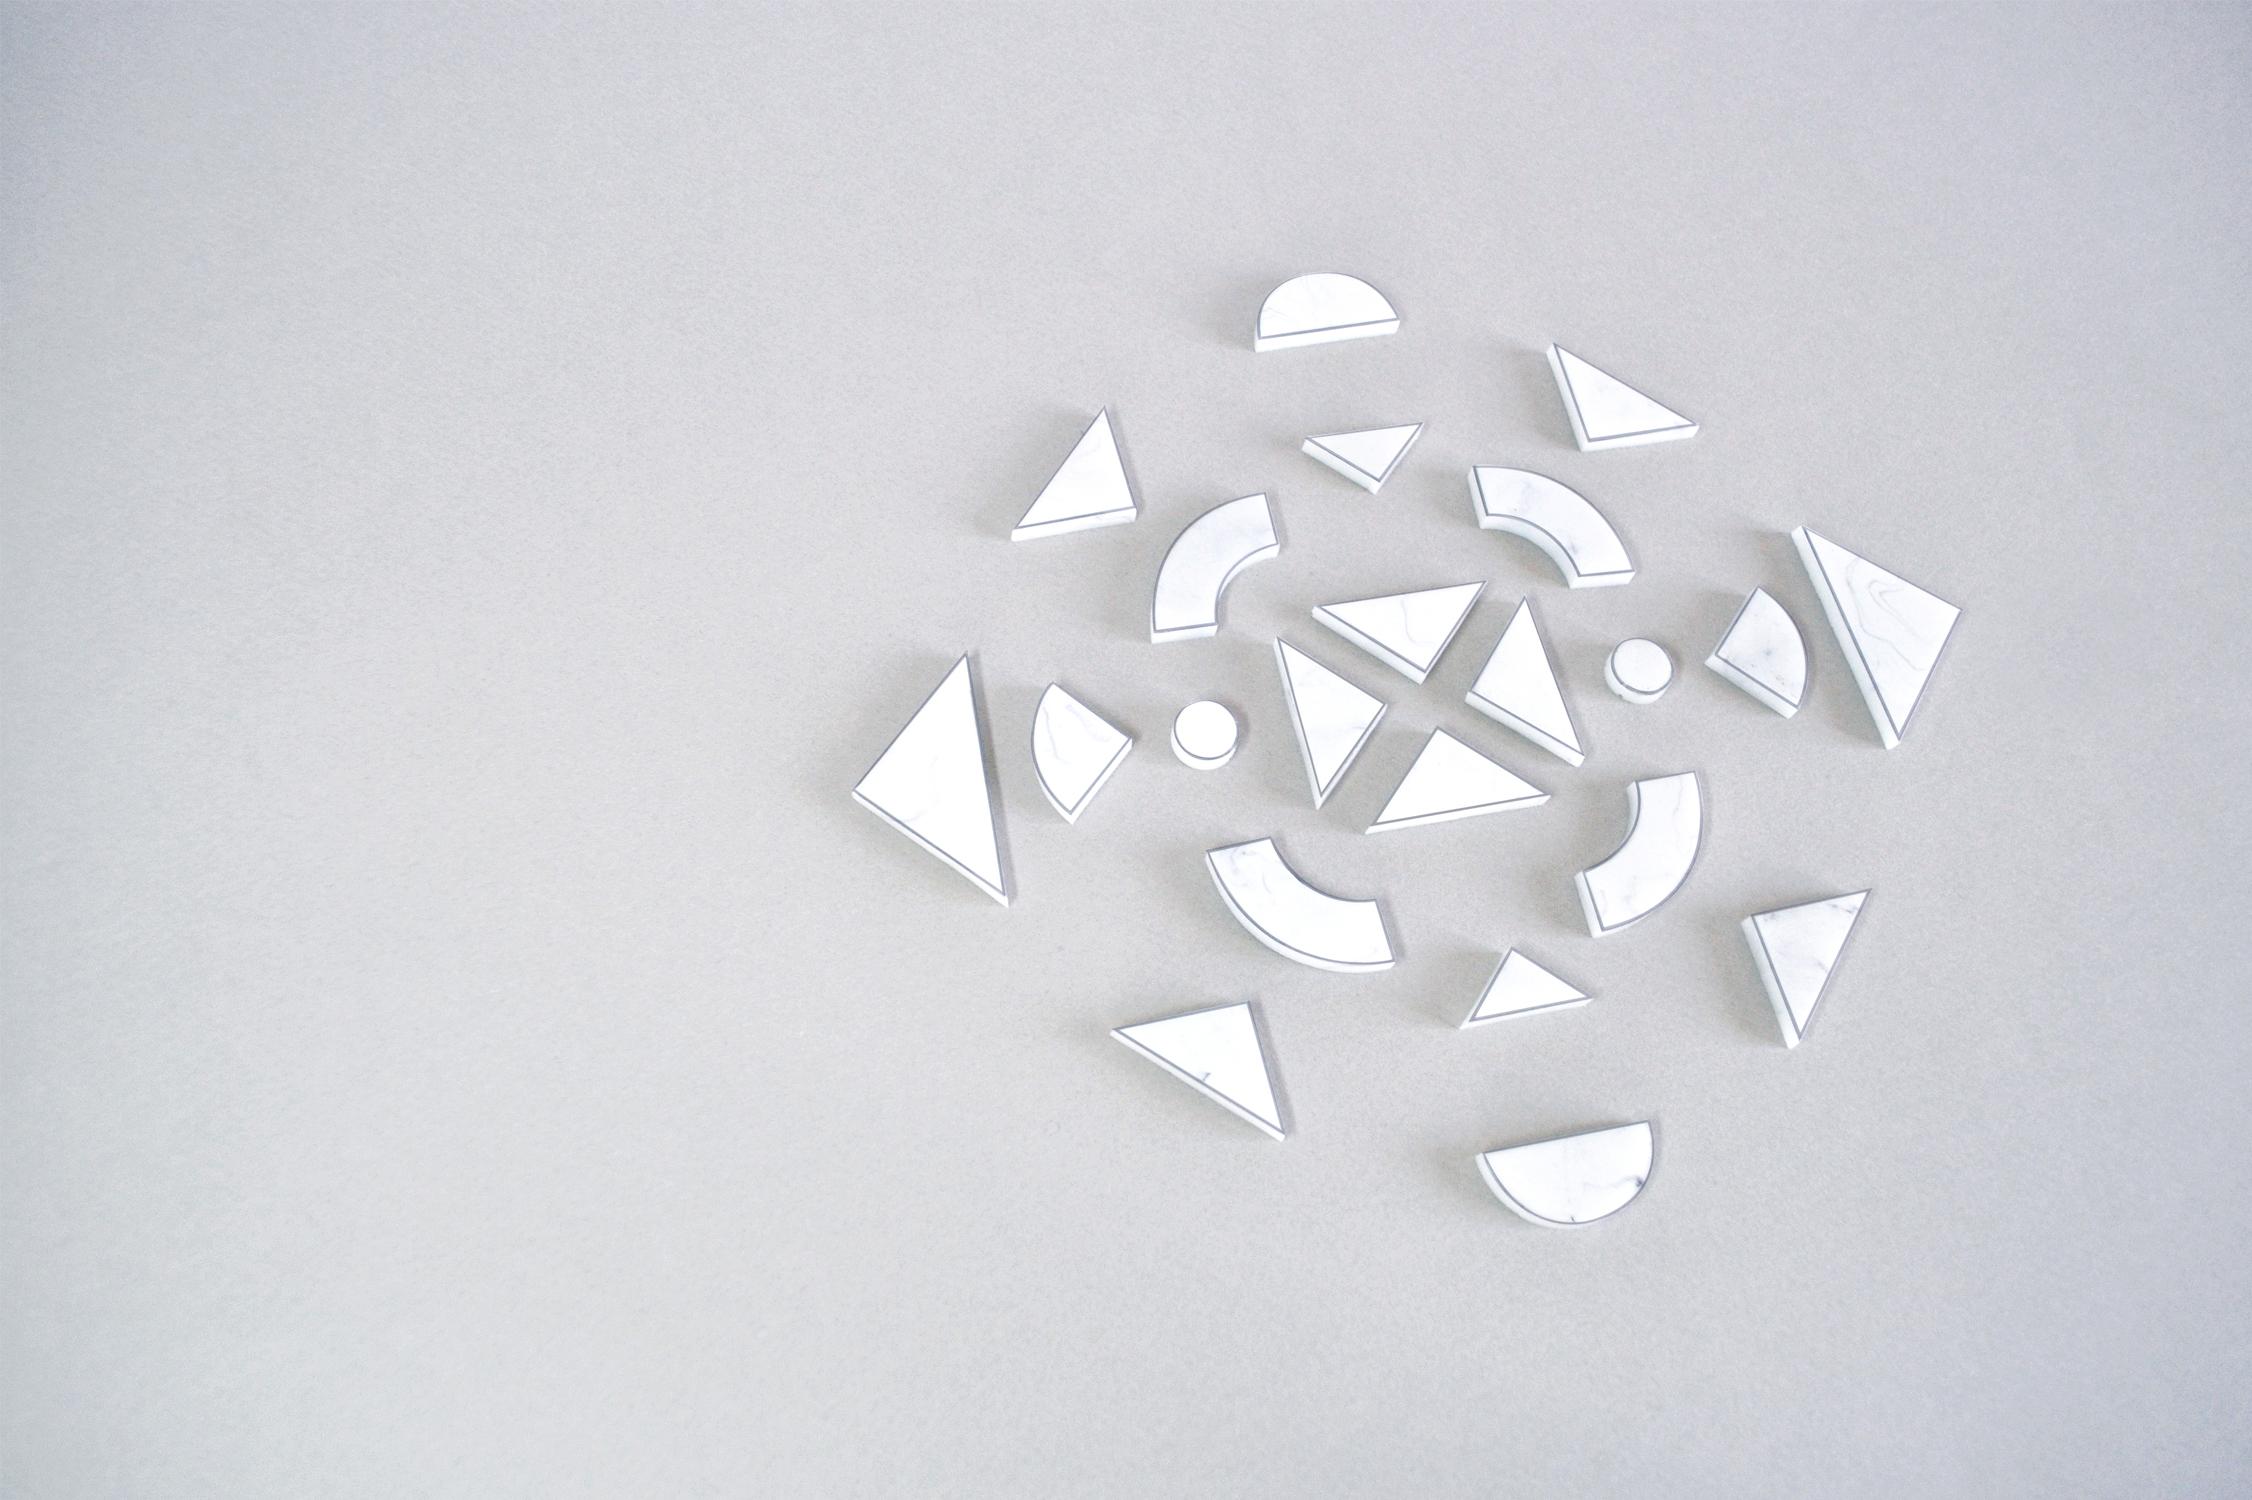 2016-09-08_57d130f99367f_geometrical-puzzle05.jpg